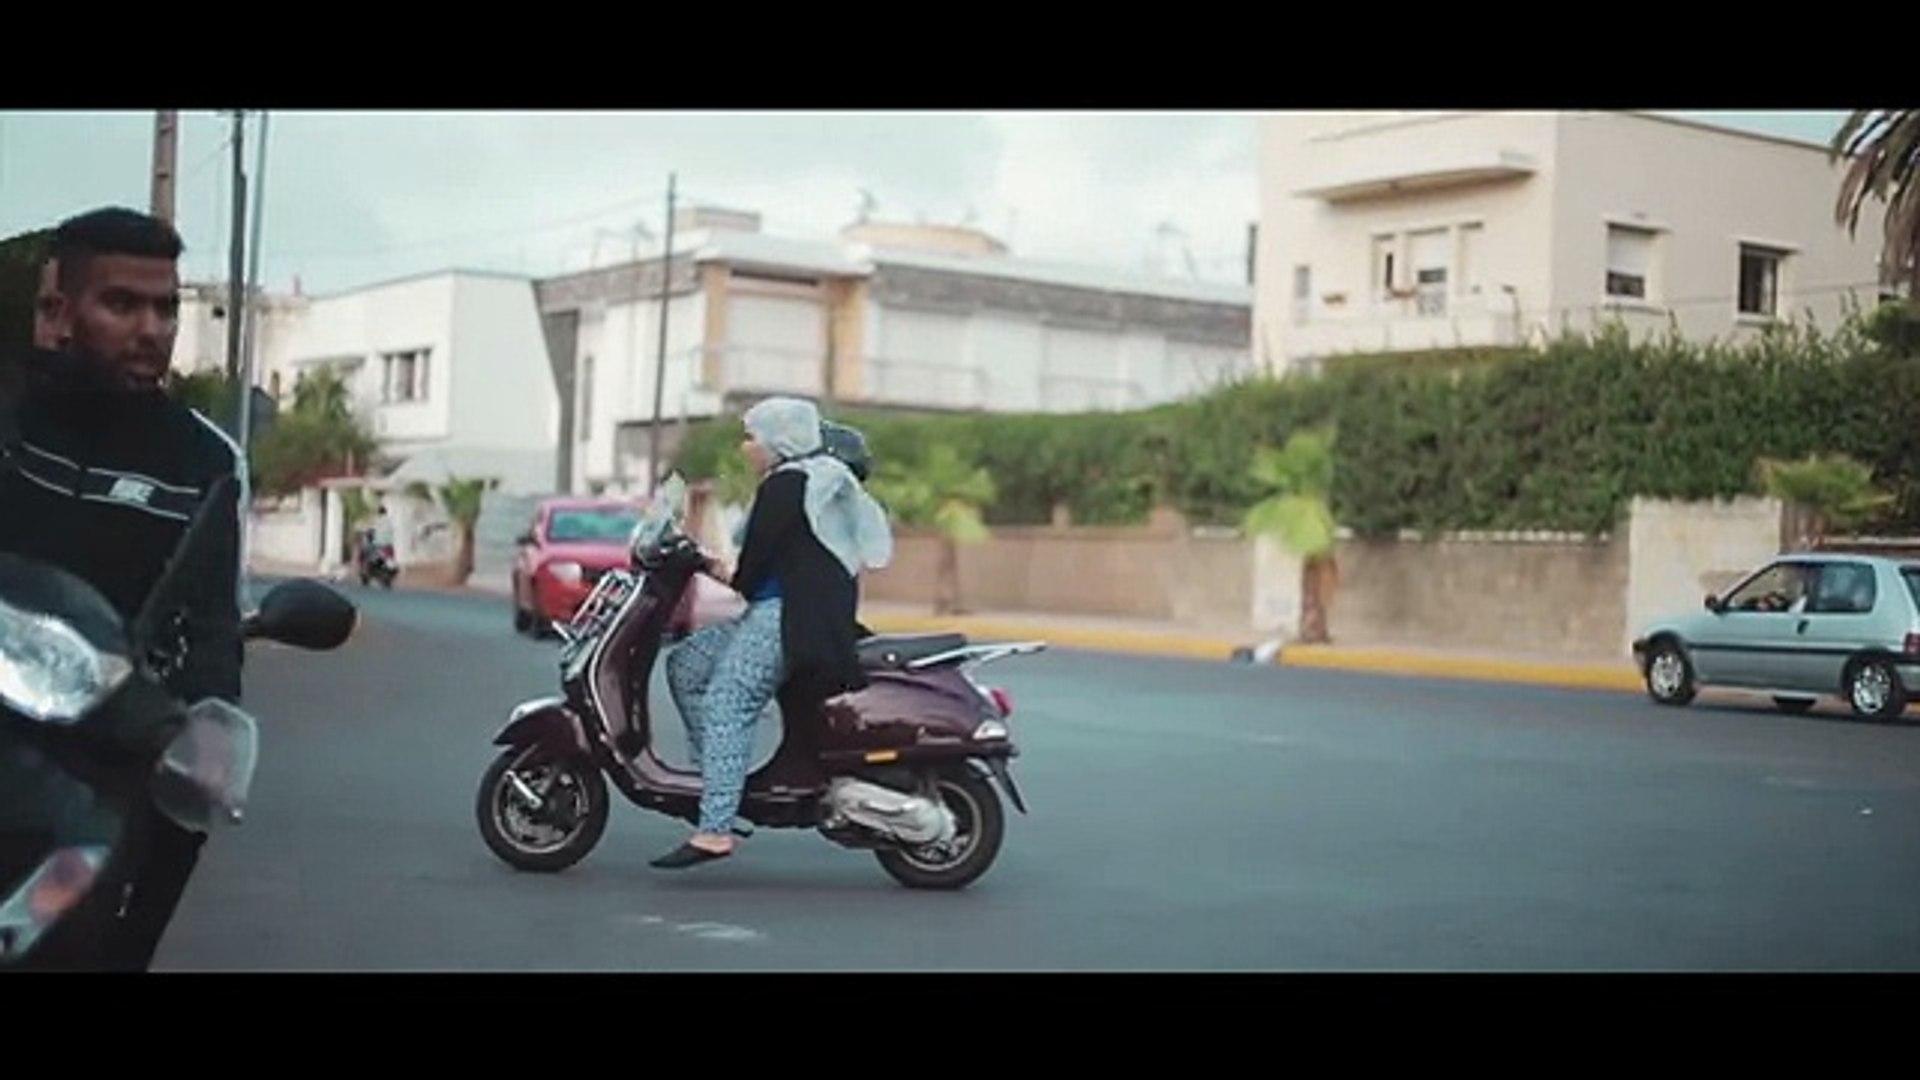 HAMZA HARD ft LBENJ - JOUJ TER9AN - البنج - جوج طرقان